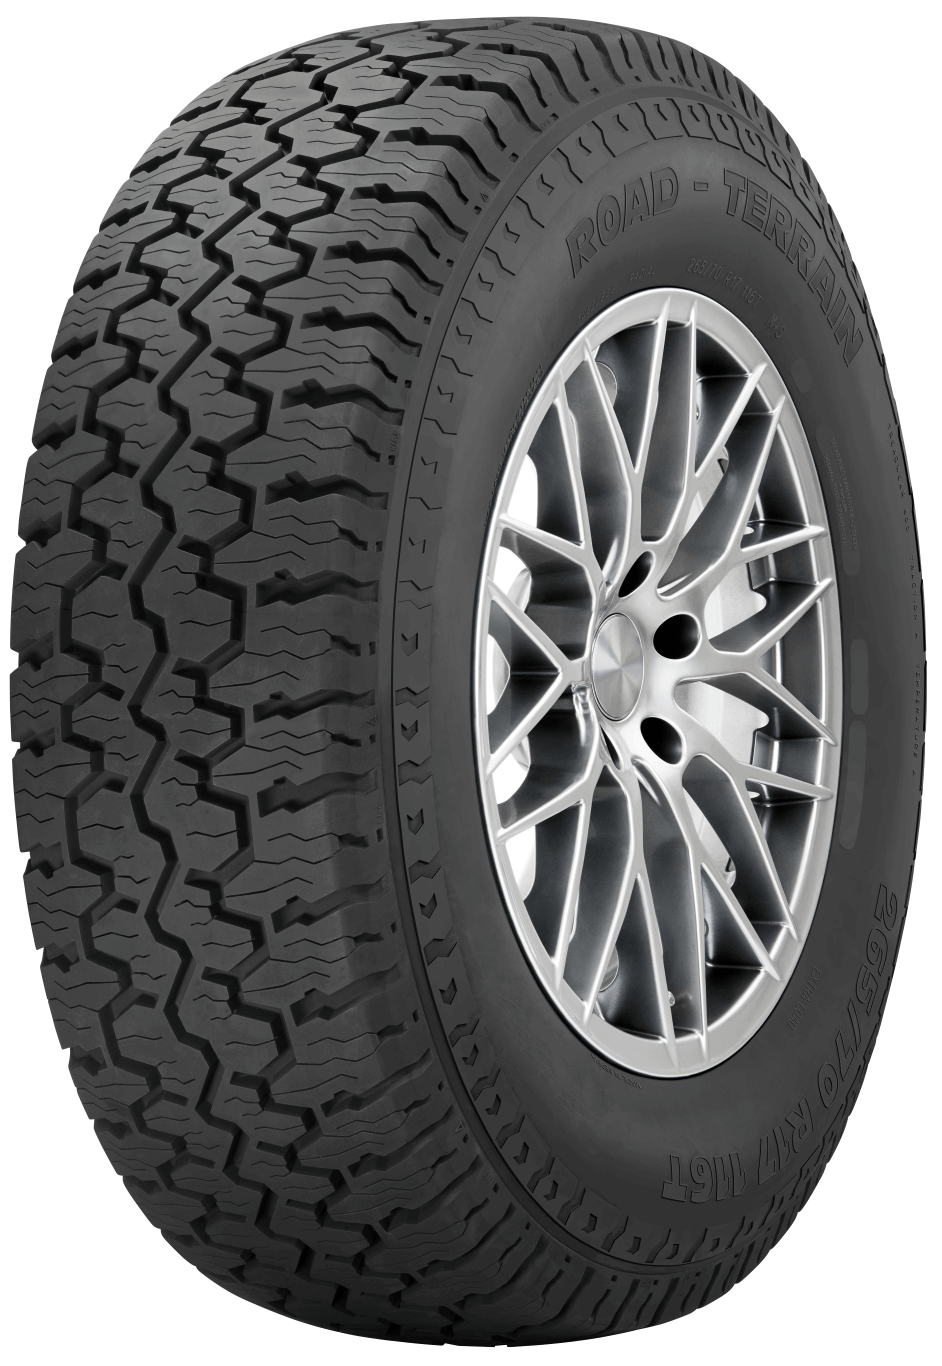 Road Terrain tyre image